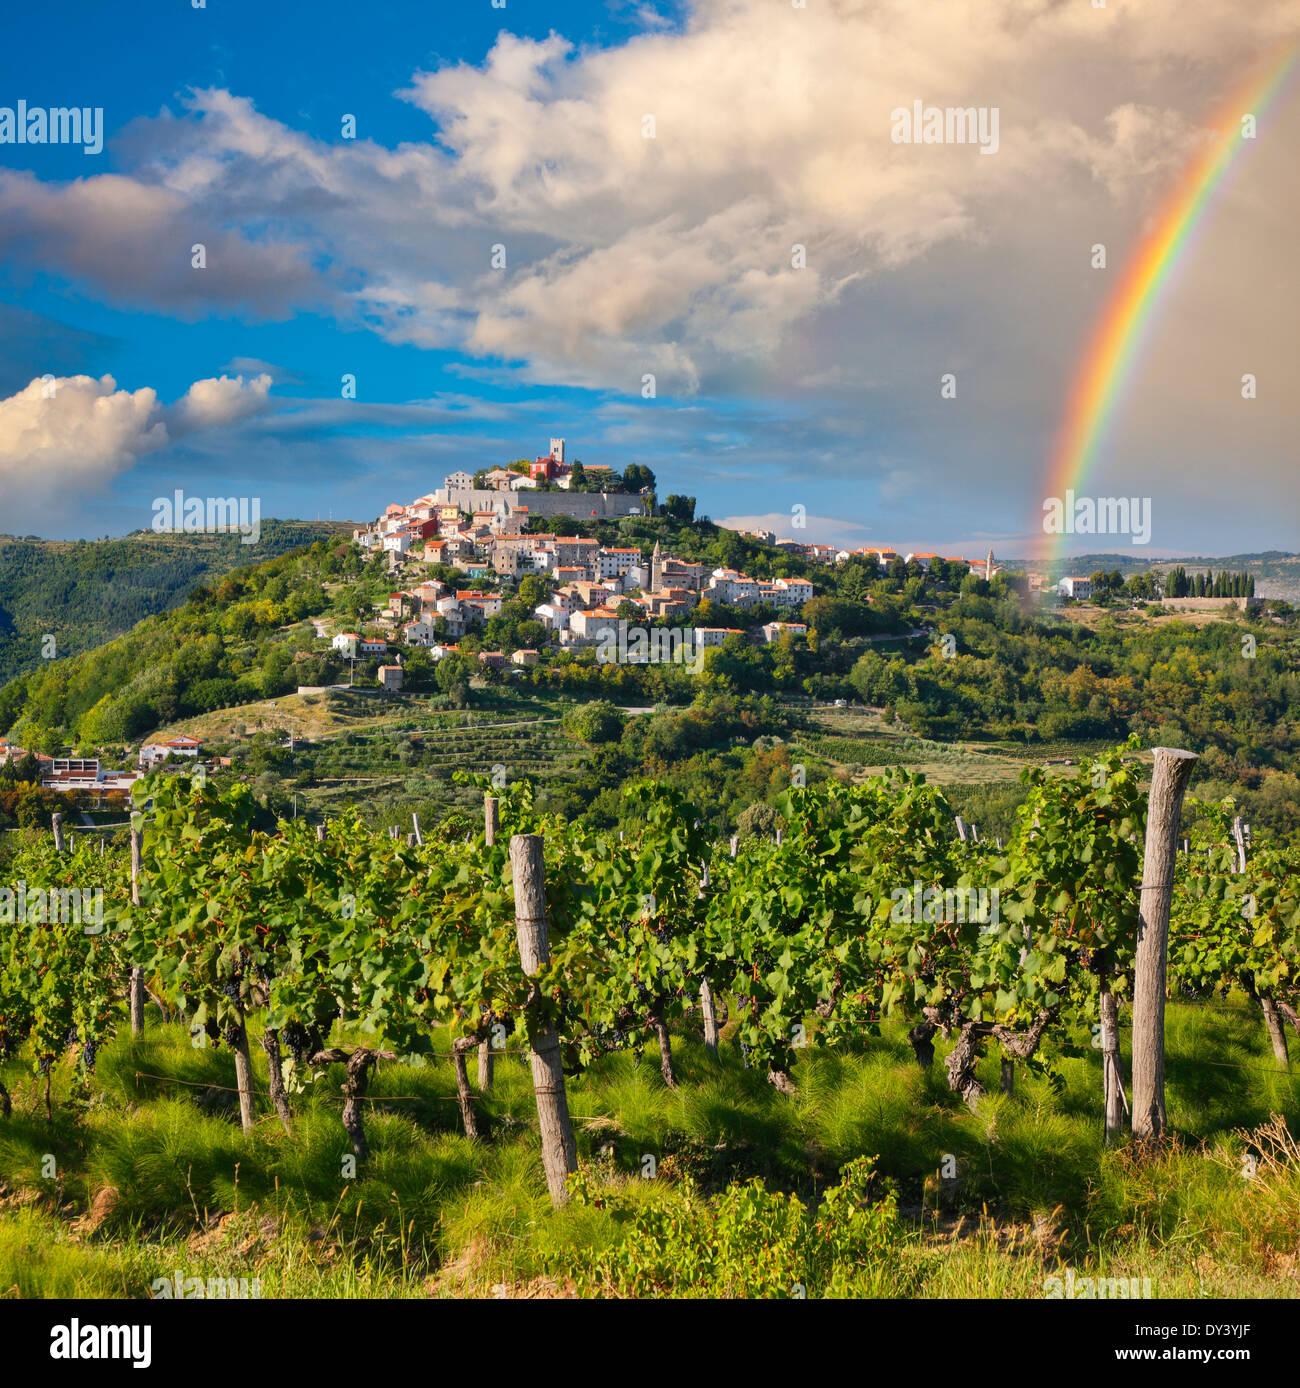 Motovun auf dem Hügel nach Regen mit Regenbogen am Himmel, Kroatien Stockbild